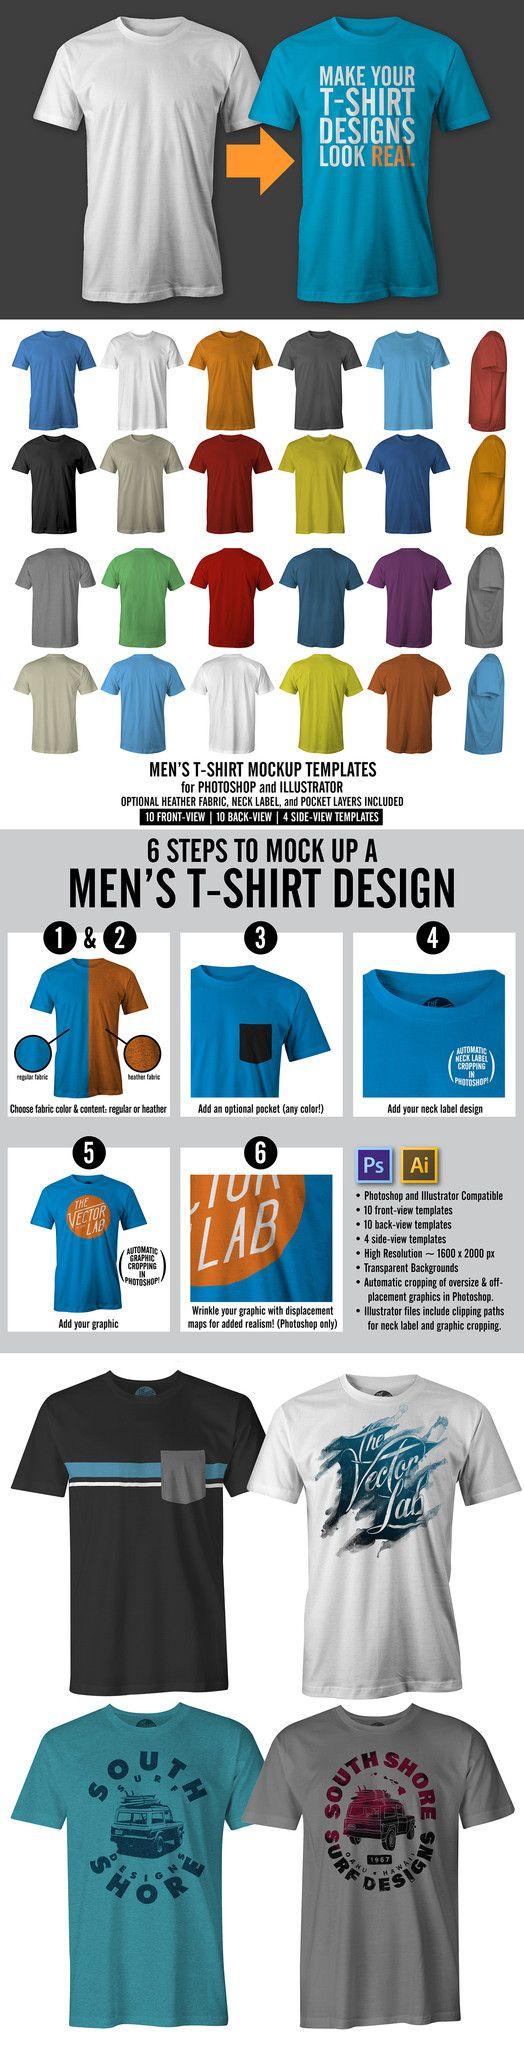 Shirt design resolution - Men S T Shirt Mockup Templates 01